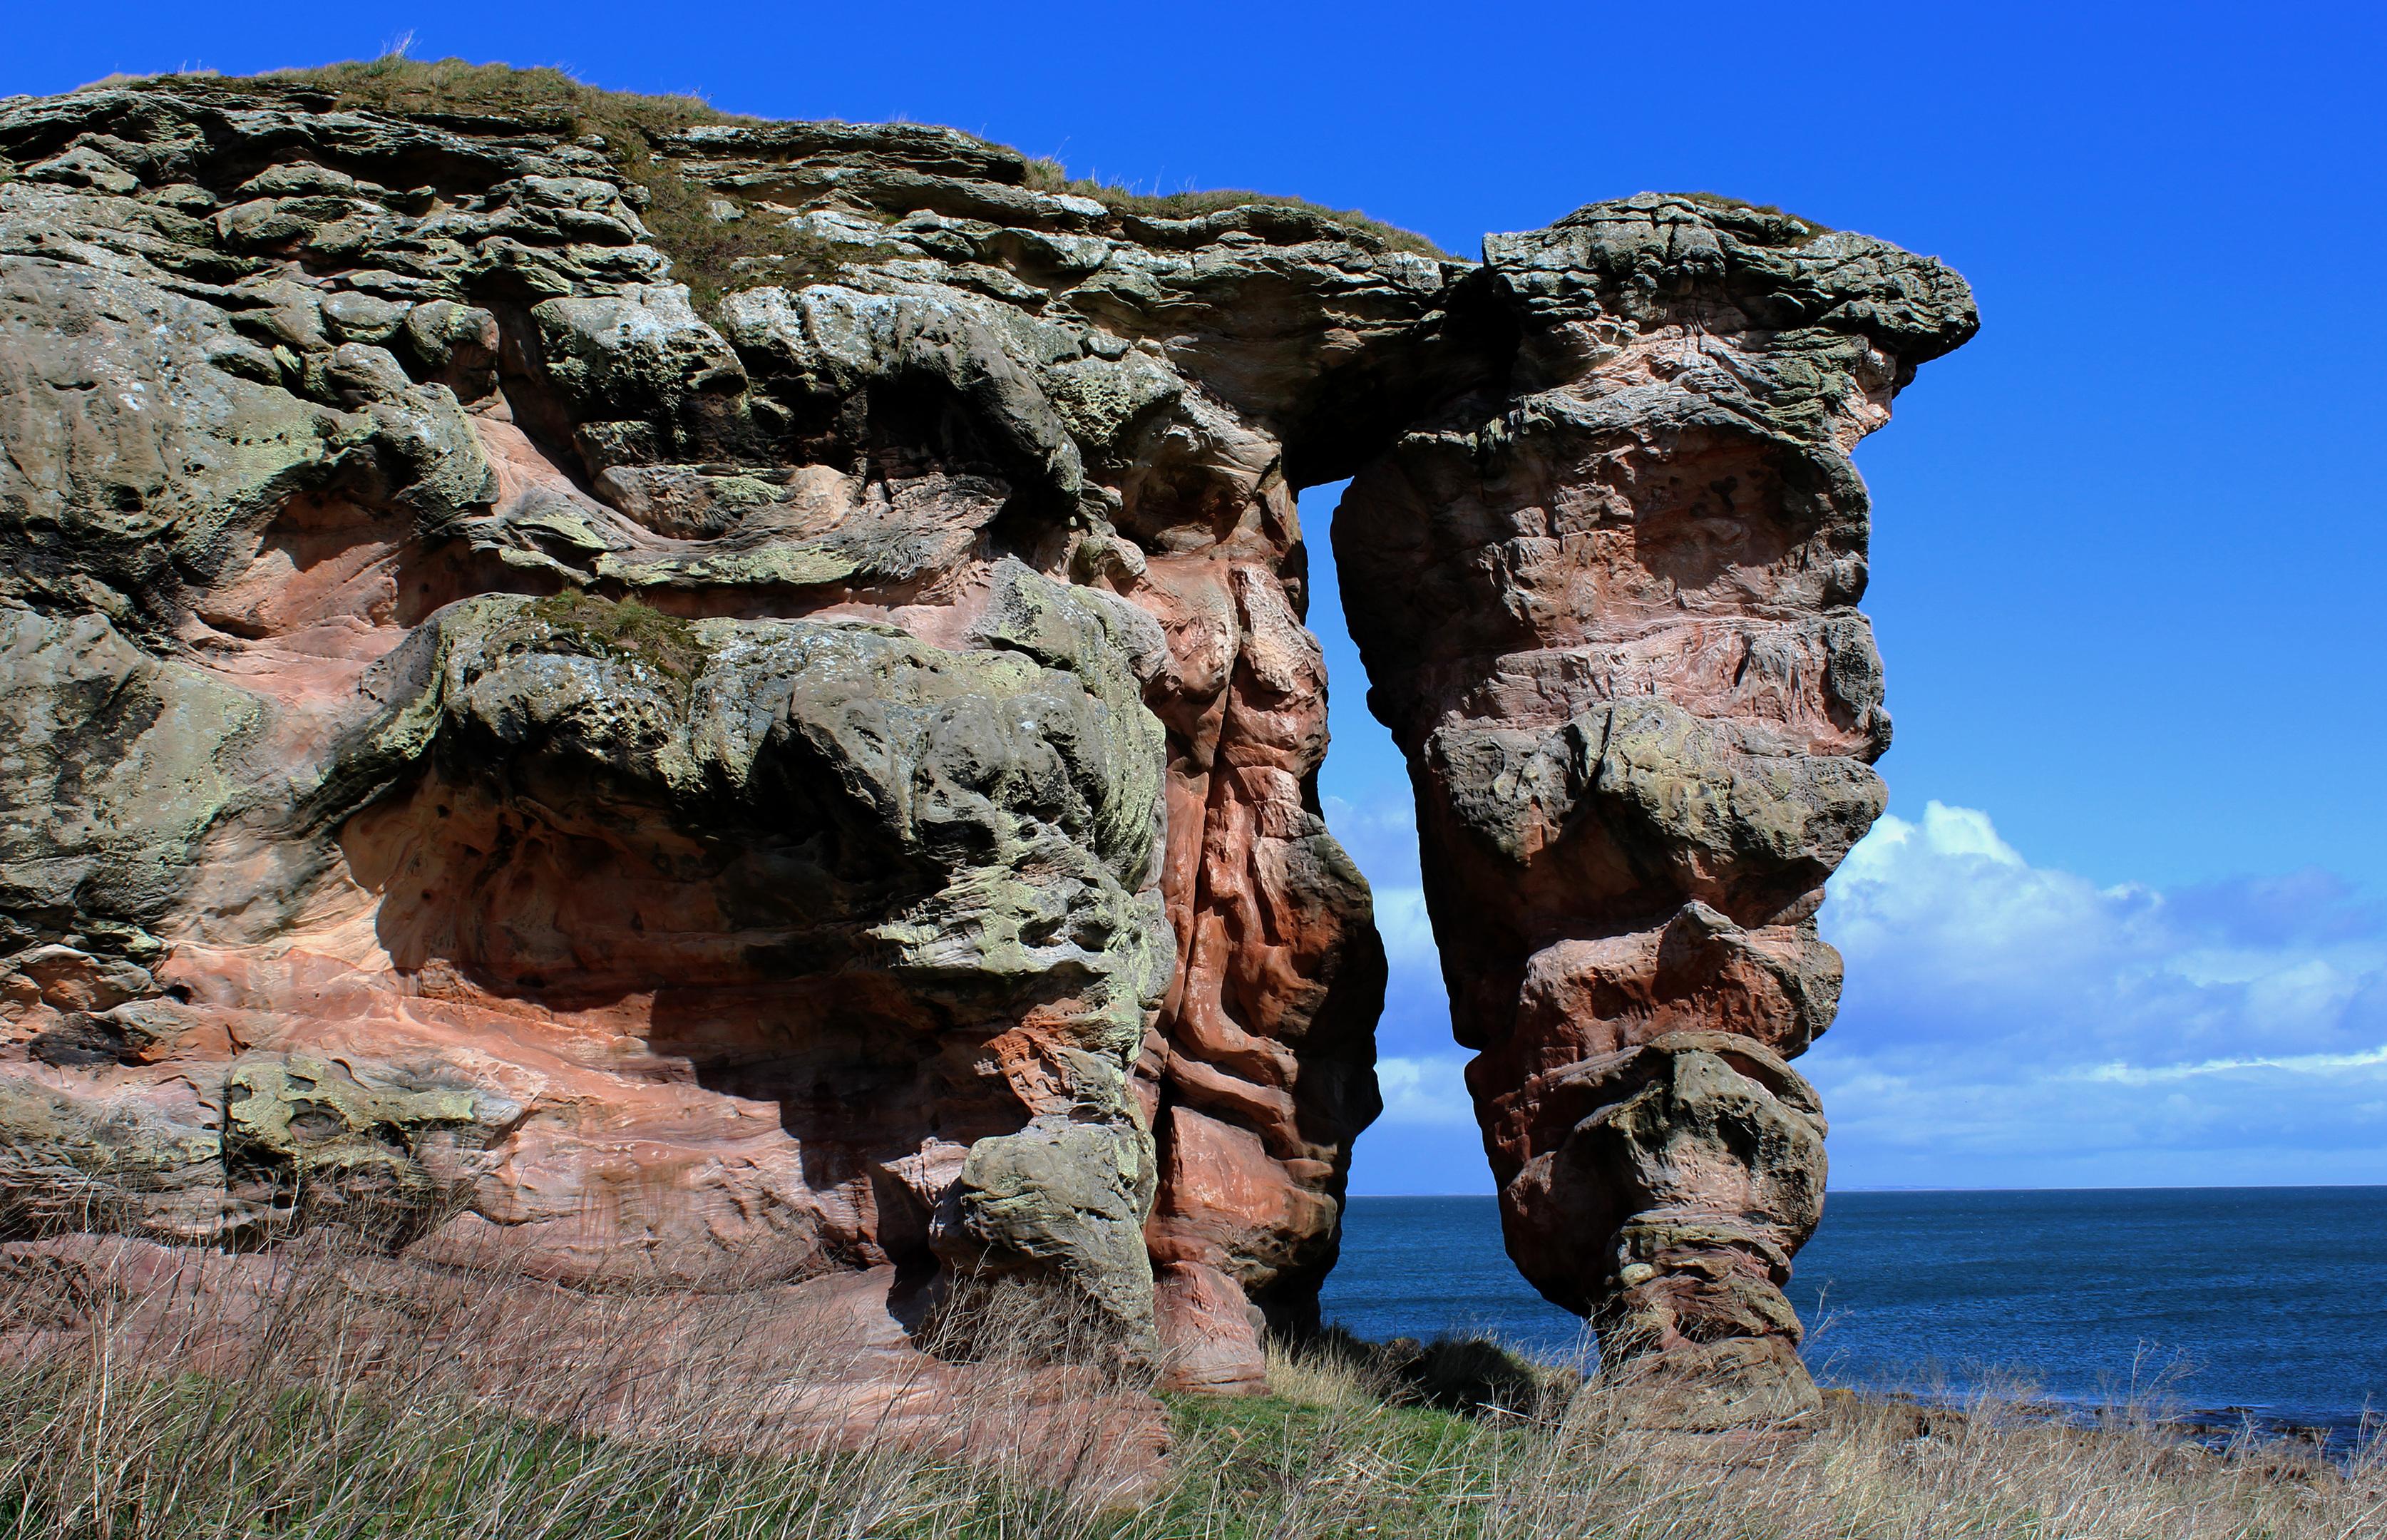 The Buddo Rock.